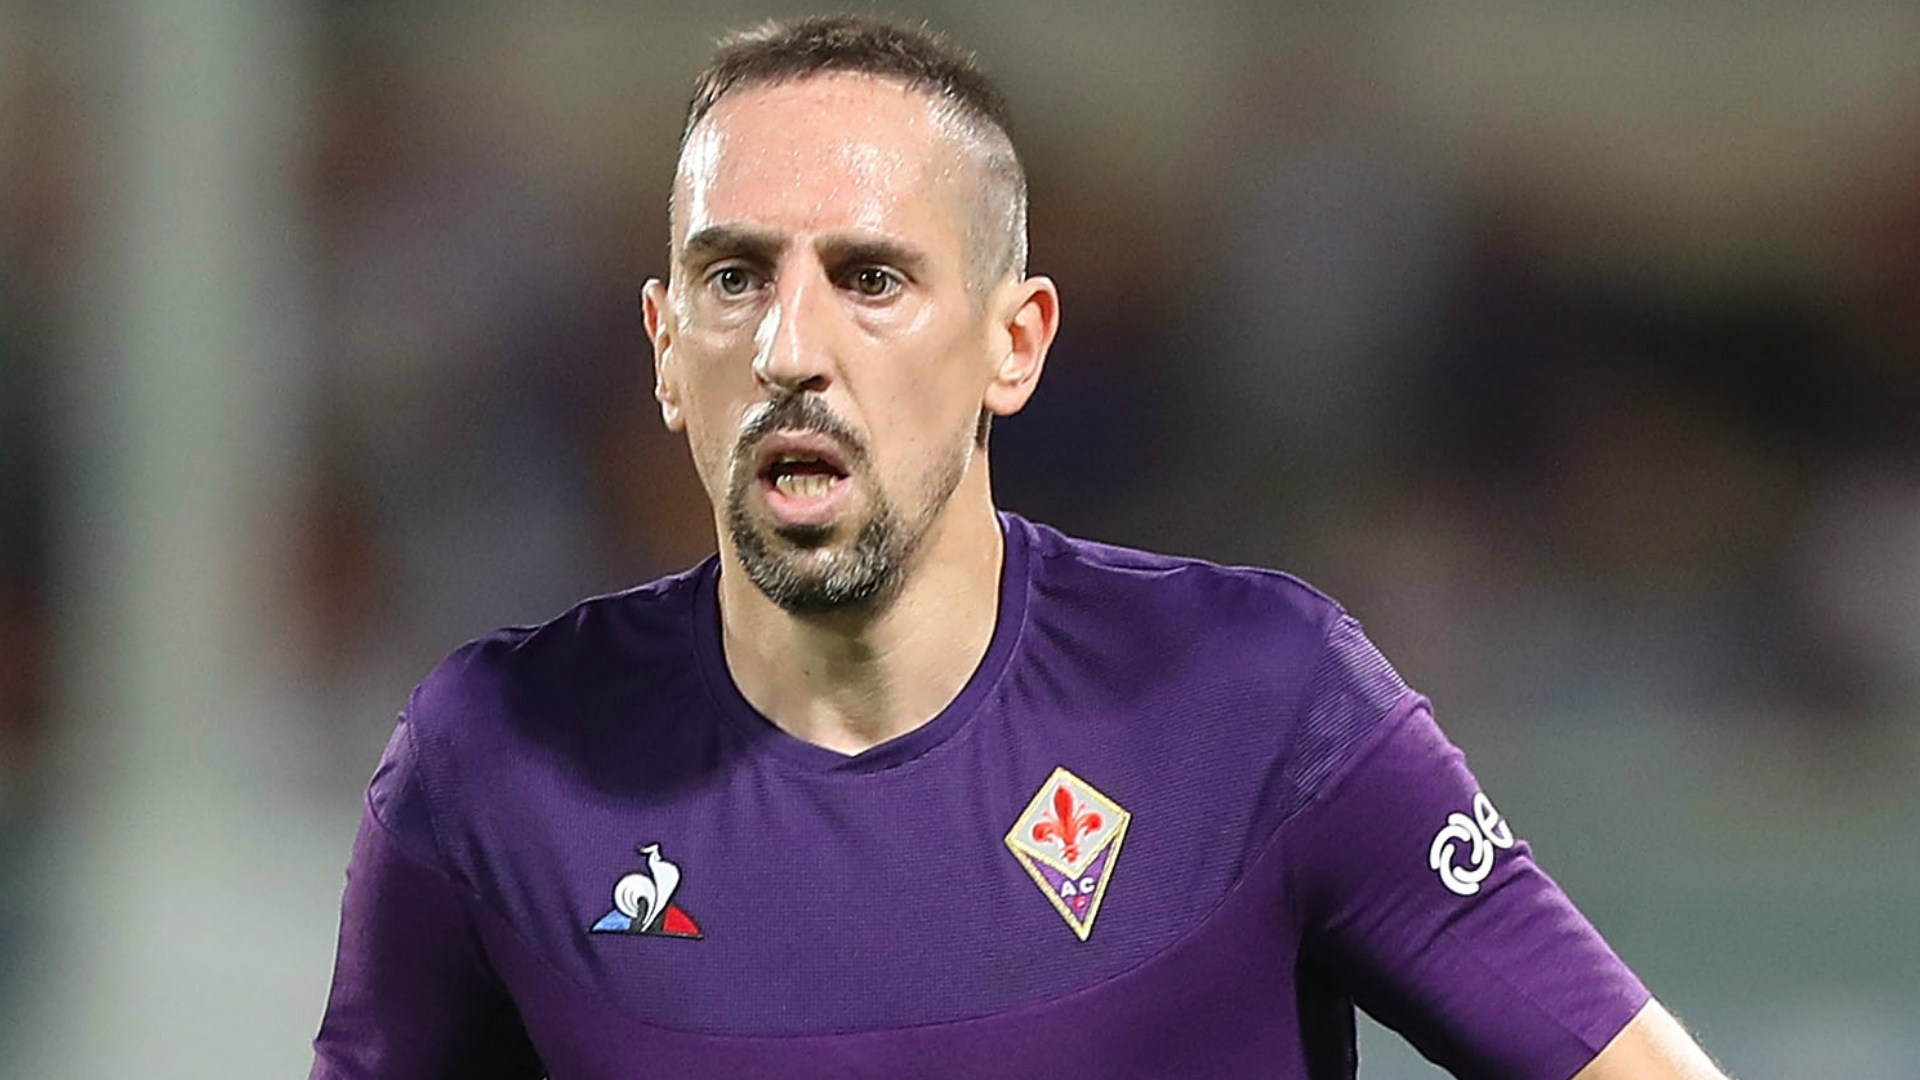 Ribery-Fiorentina